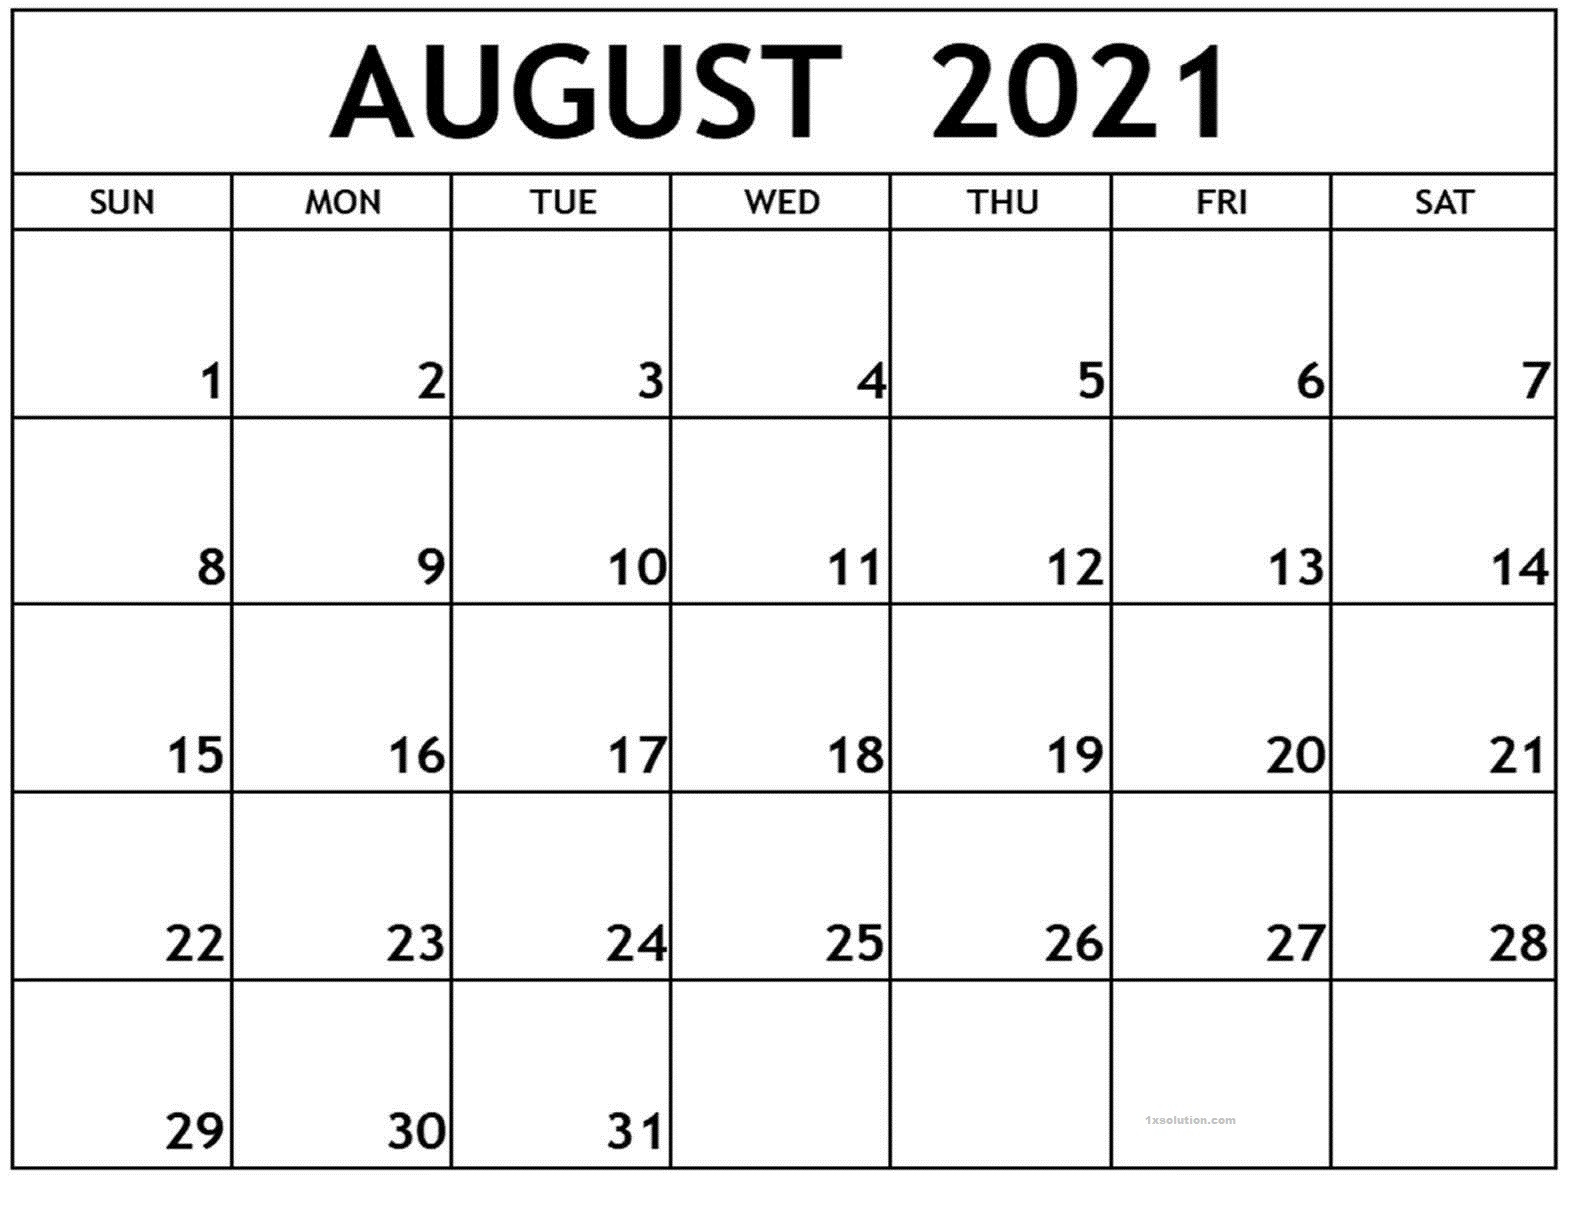 August 2021 Calendar Printable Schedule Excelsheet   Calendar  August 2021 To December 2021 Calender